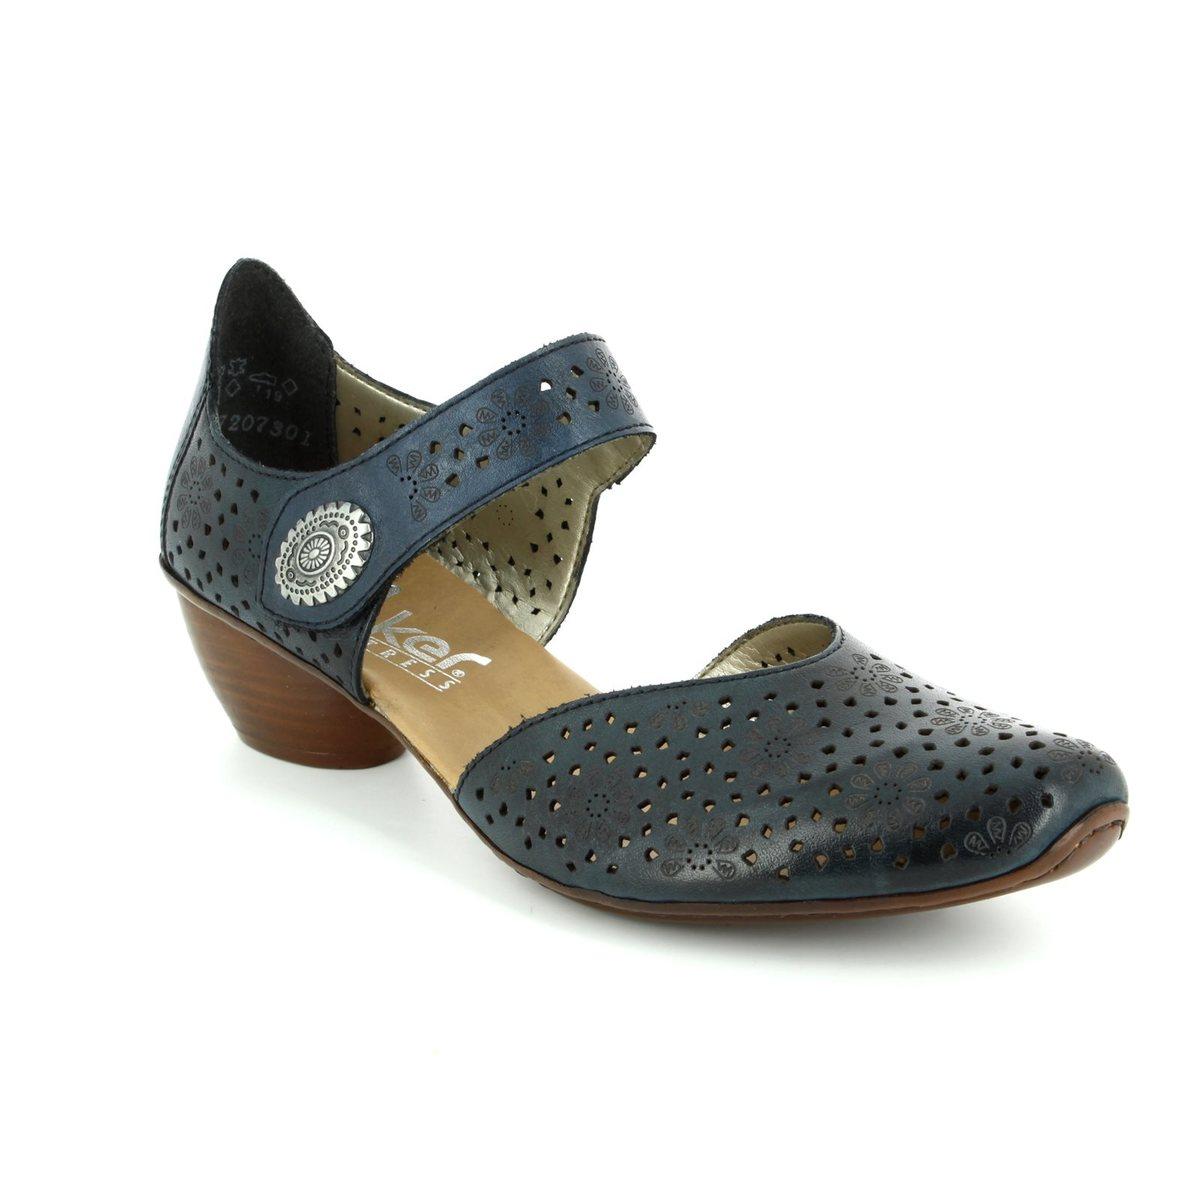 Rieker Sierra Womens Long Boots 639 Tan